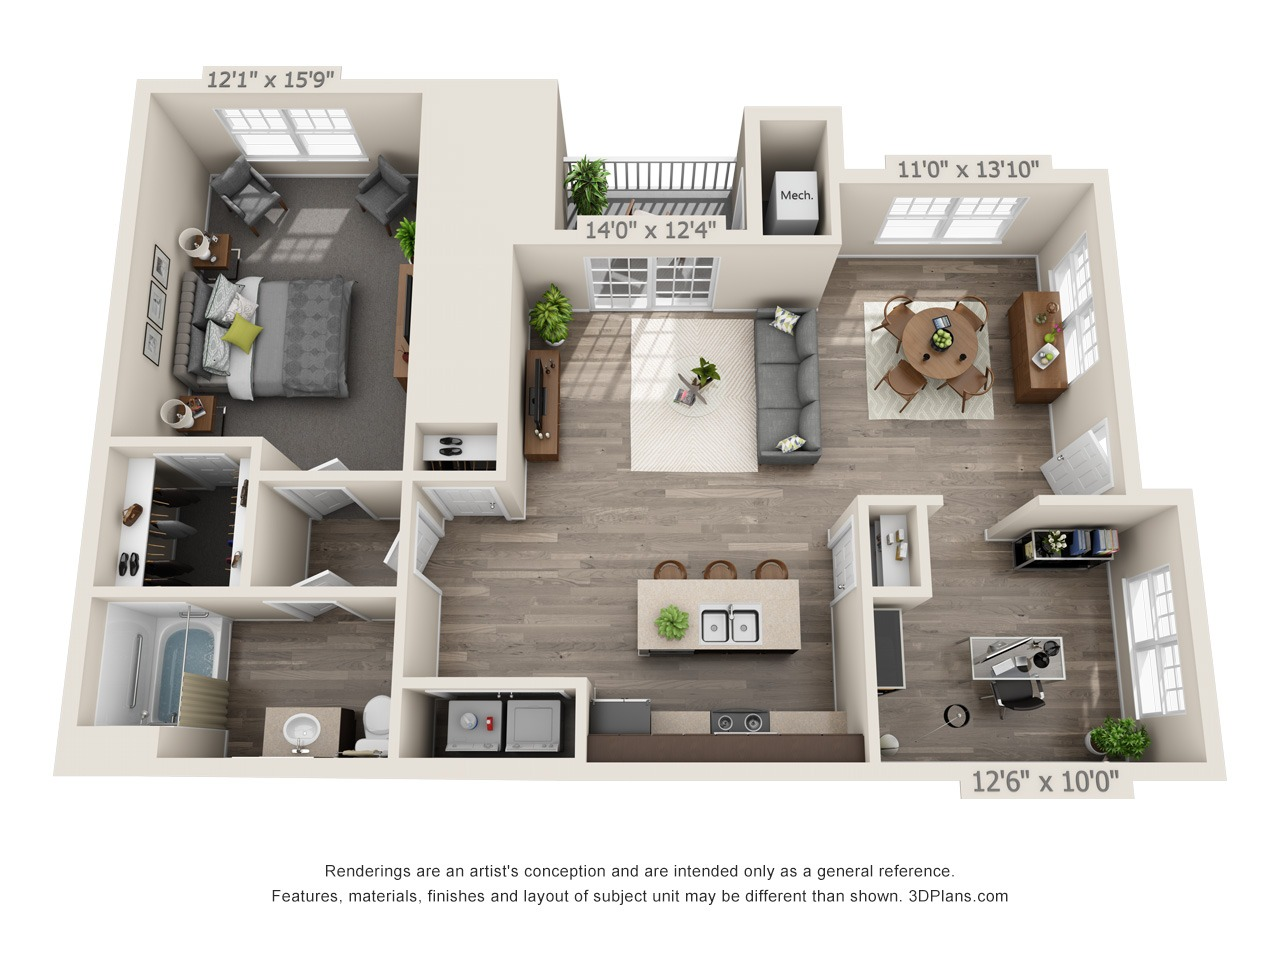 AD - 1 Bed / 1 Bath with Den - 1st Floor - 1,002 SF